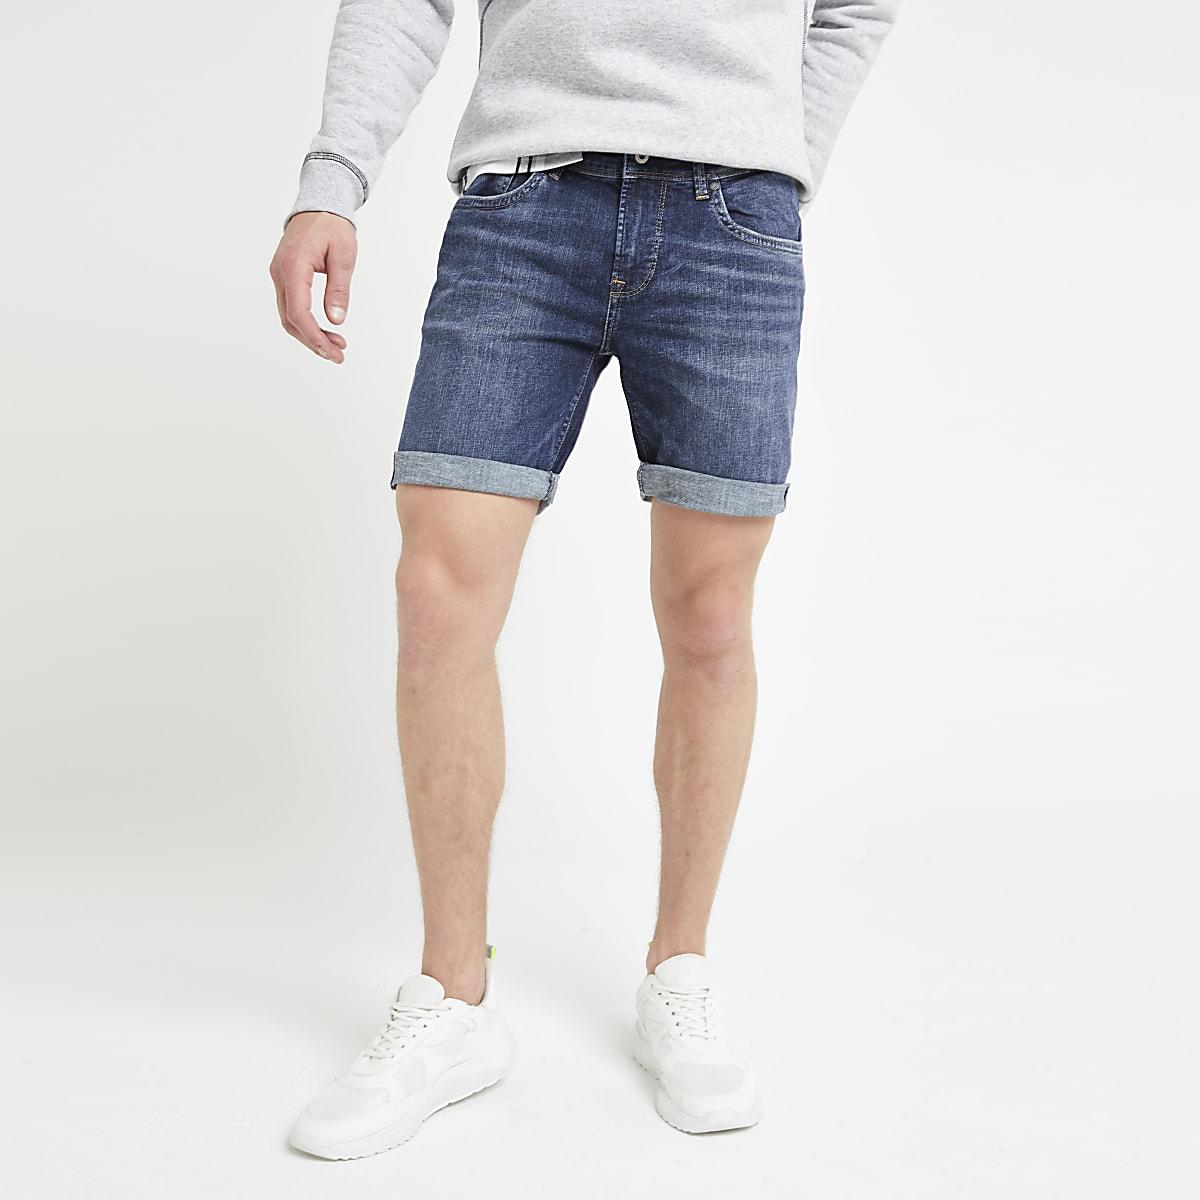 Pepe Jeans blue slim fit denim shorts